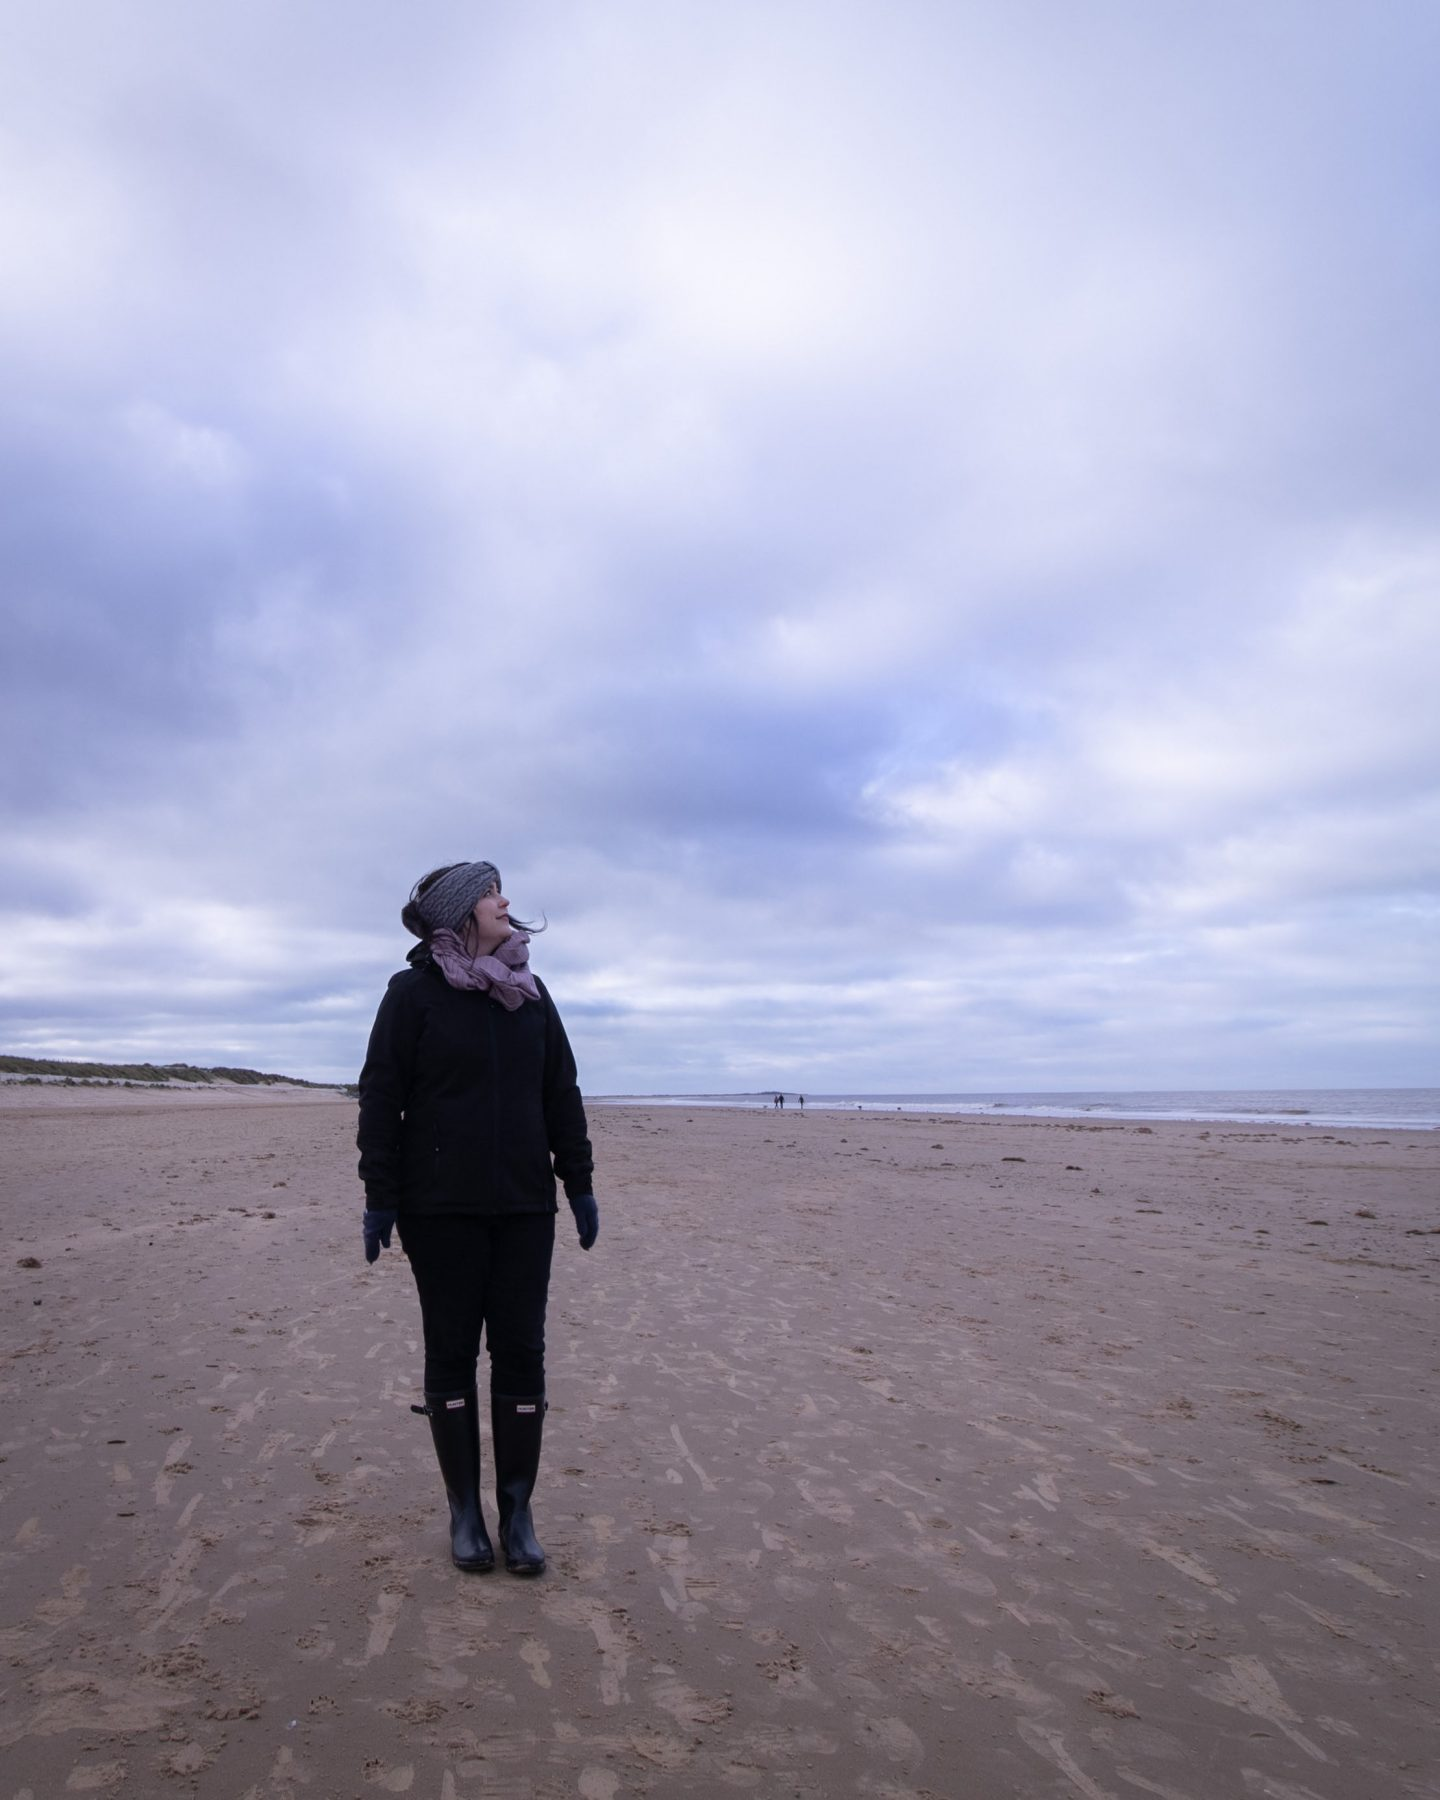 on the norfolk beach